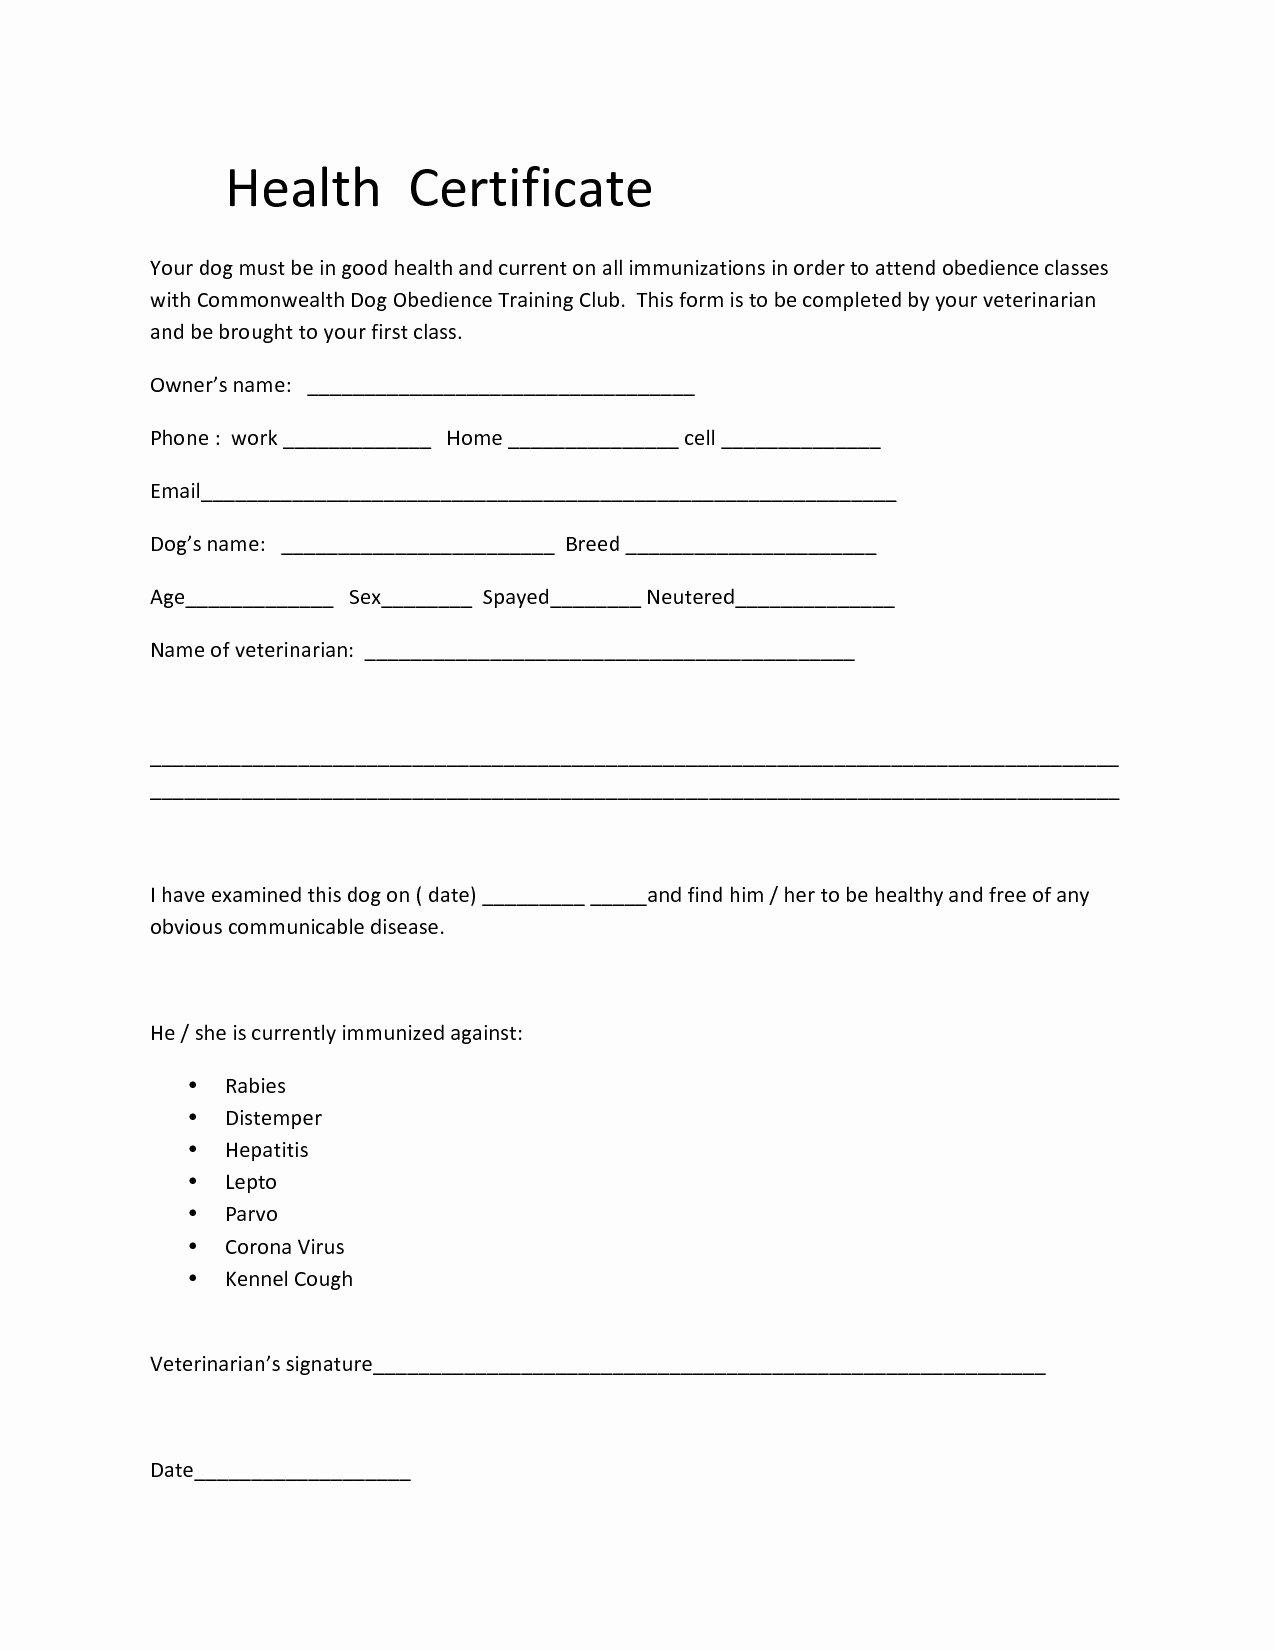 Pet Health Certificate Template Inspirational Sample Health Certificate In the Philippines New Br as